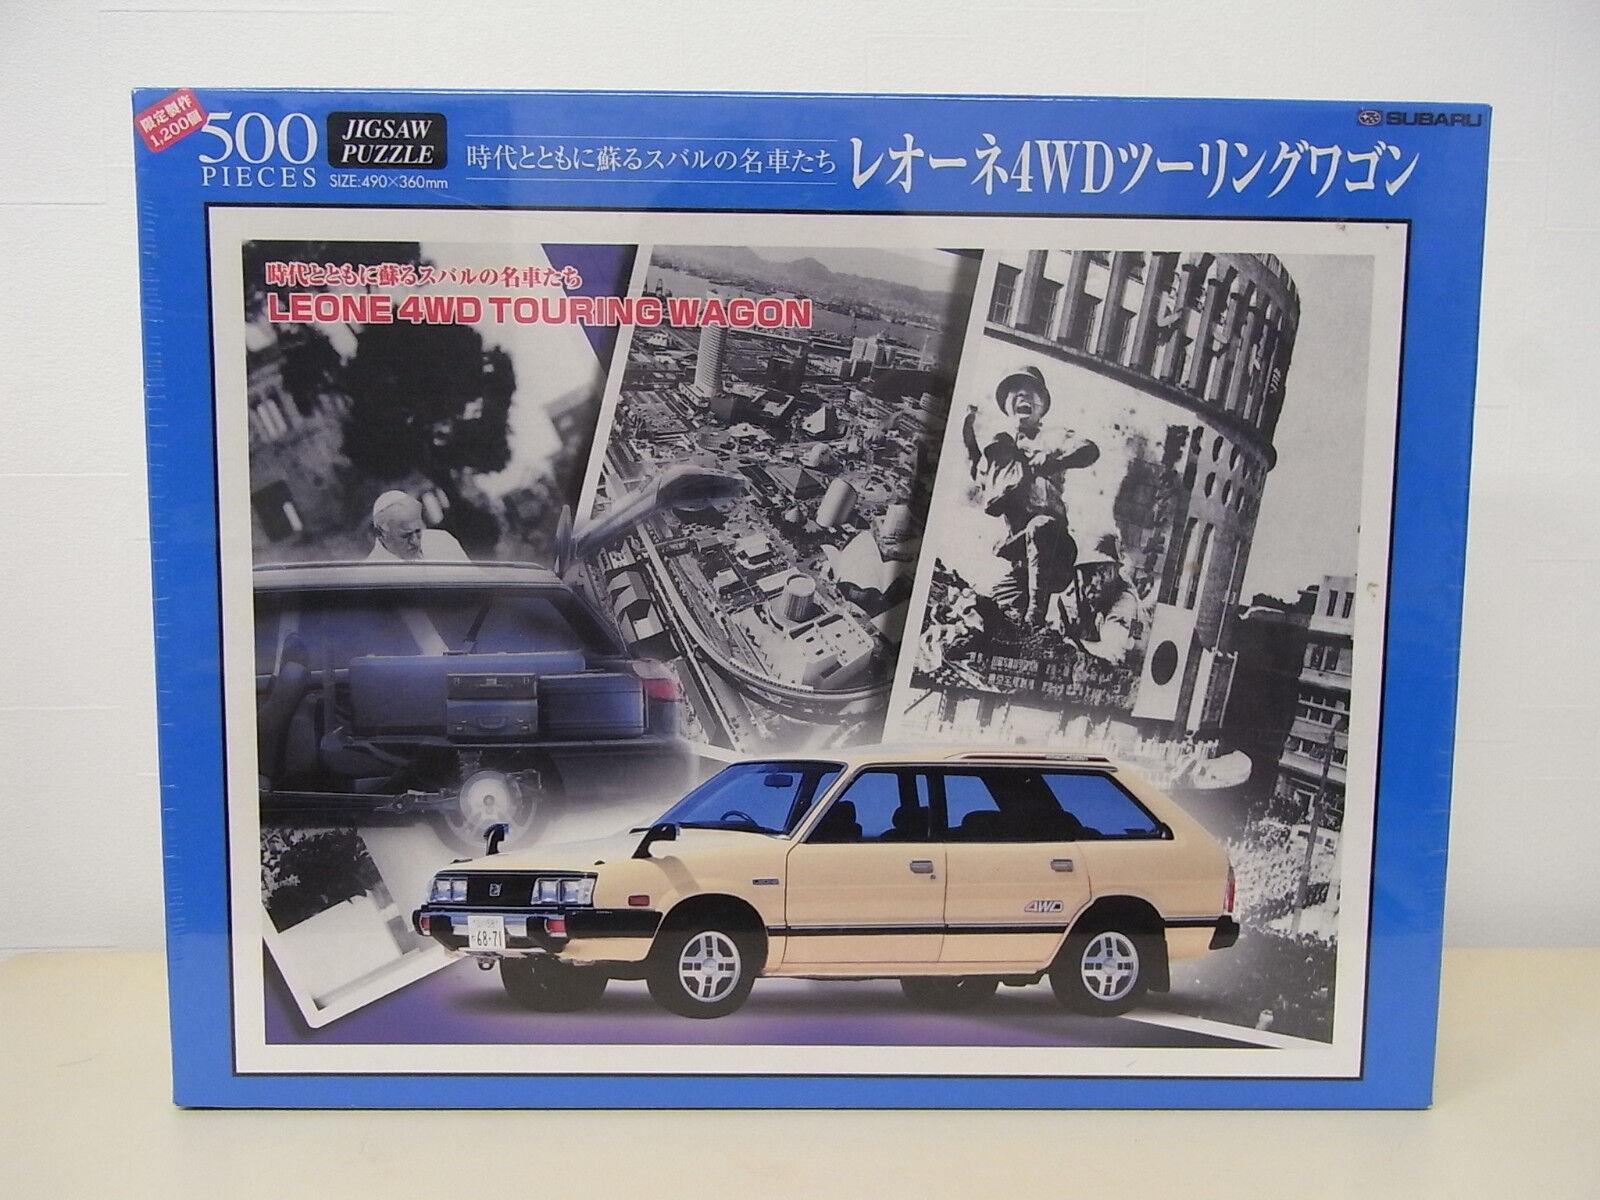 [GOODS] Subaru Leone 4WD Touring Wagon Jigsaw Puzzle 500pieces Japan EA81 AB